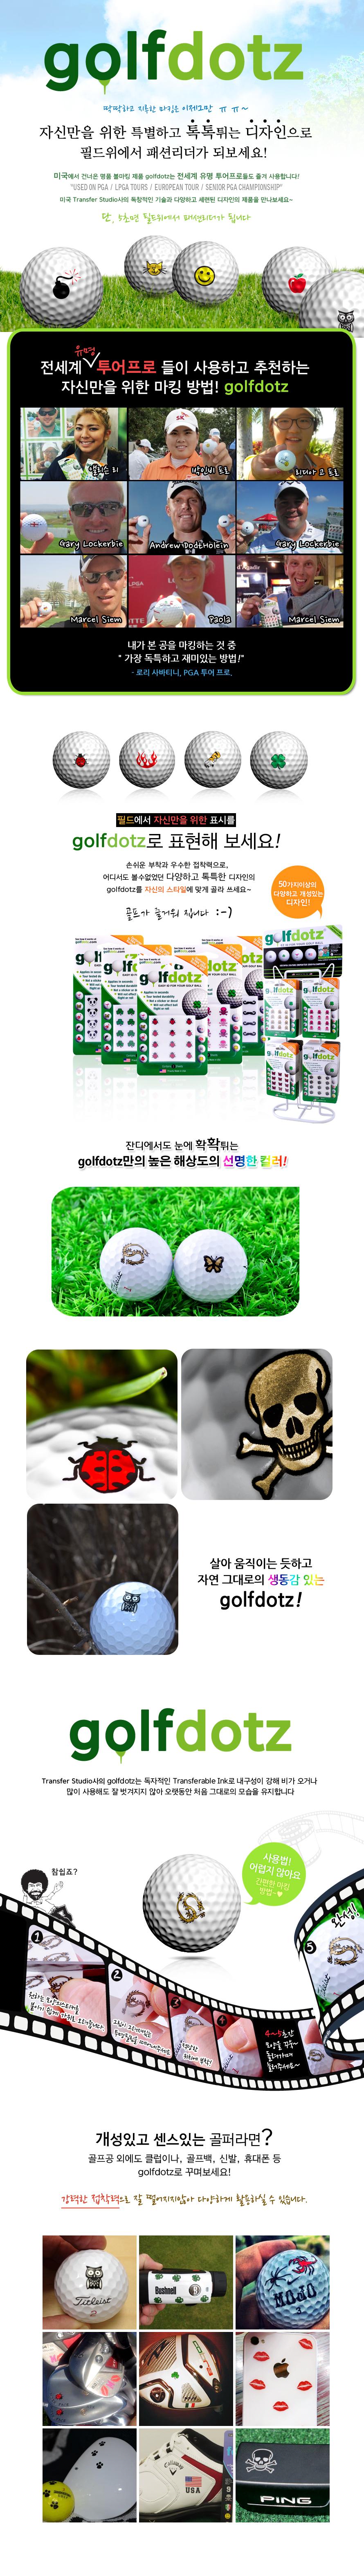 http://ai.esmplus.com/cathay/2016/golfdotz/animal_890.jpg